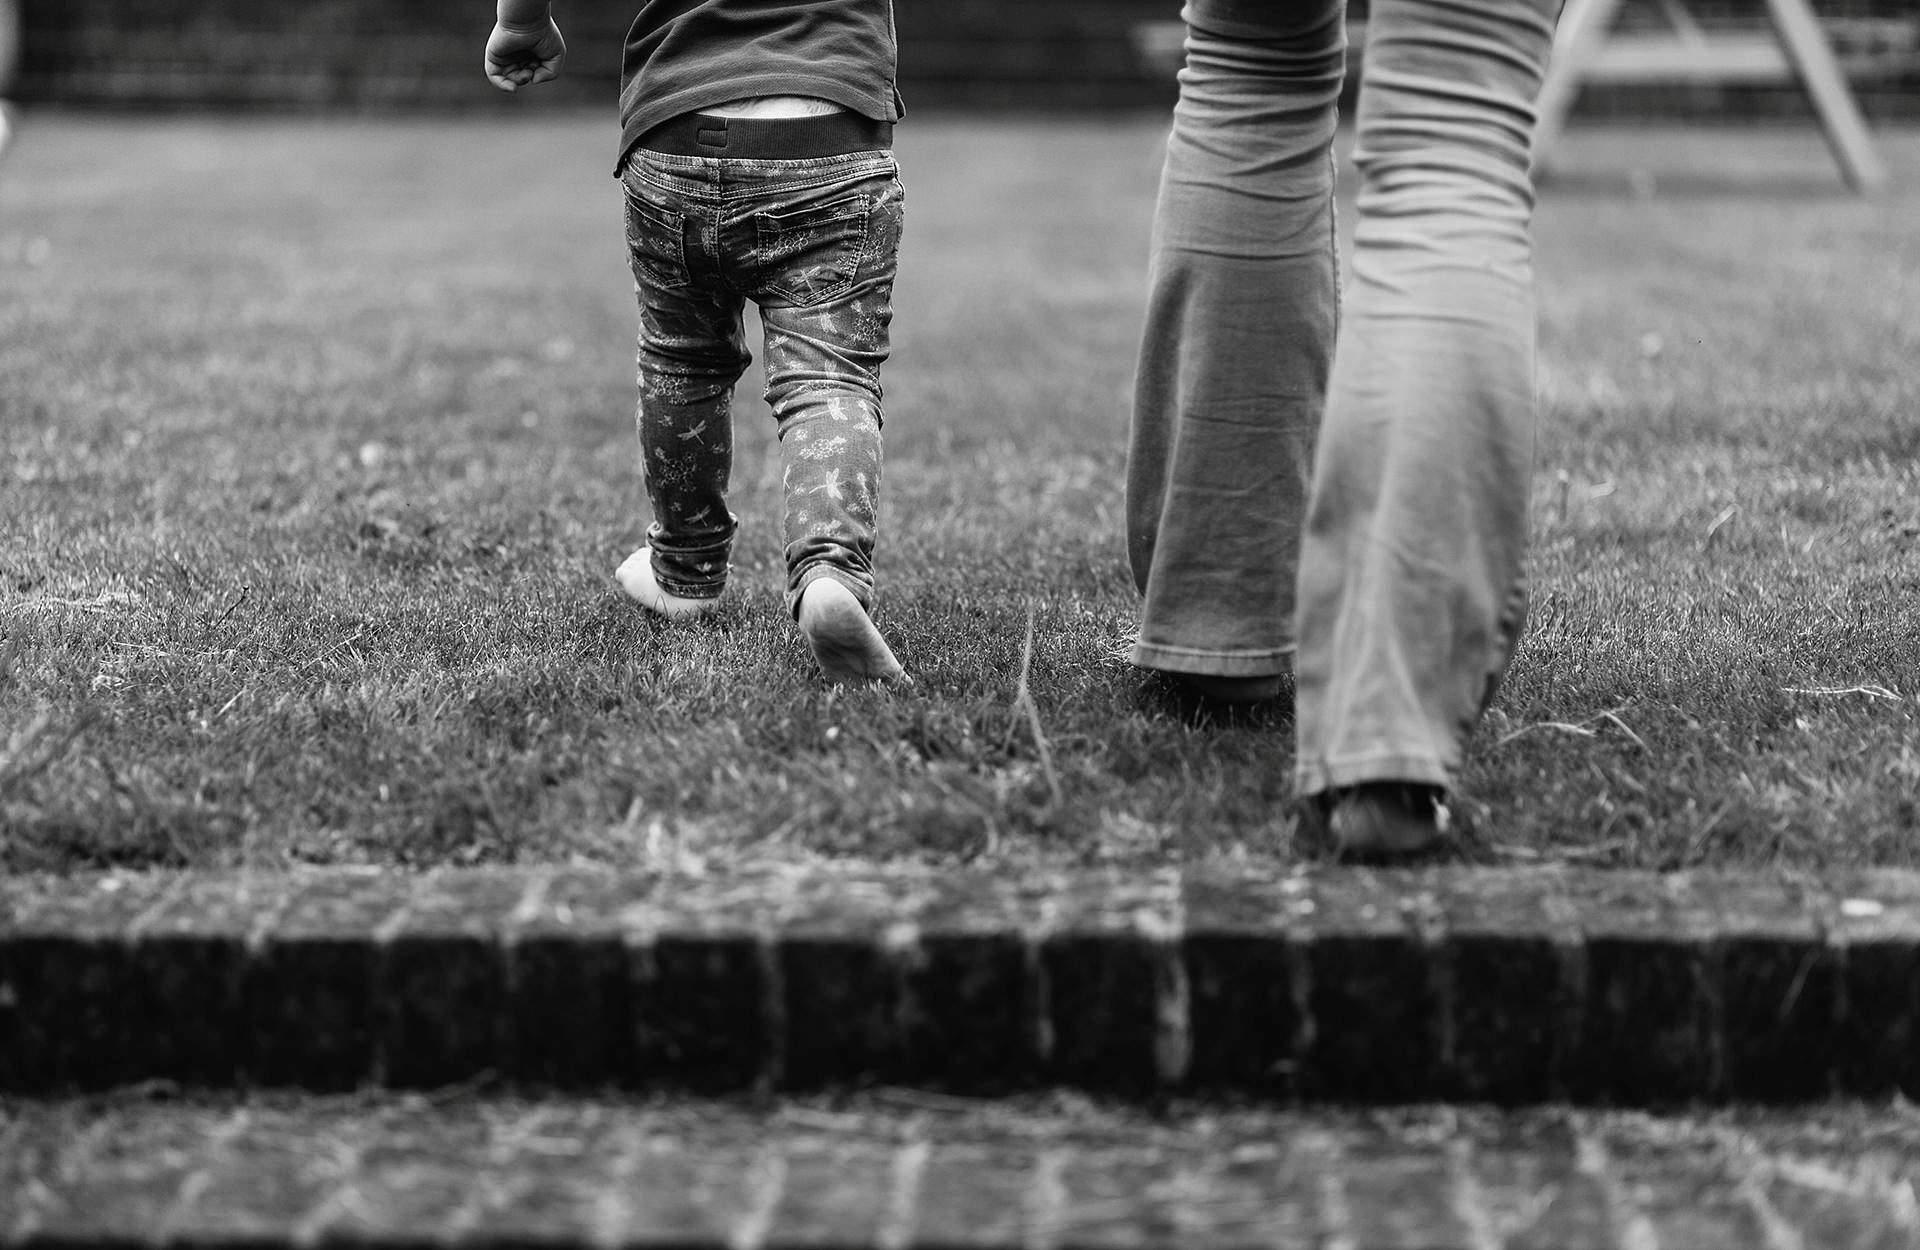 Mum and daughter walking away